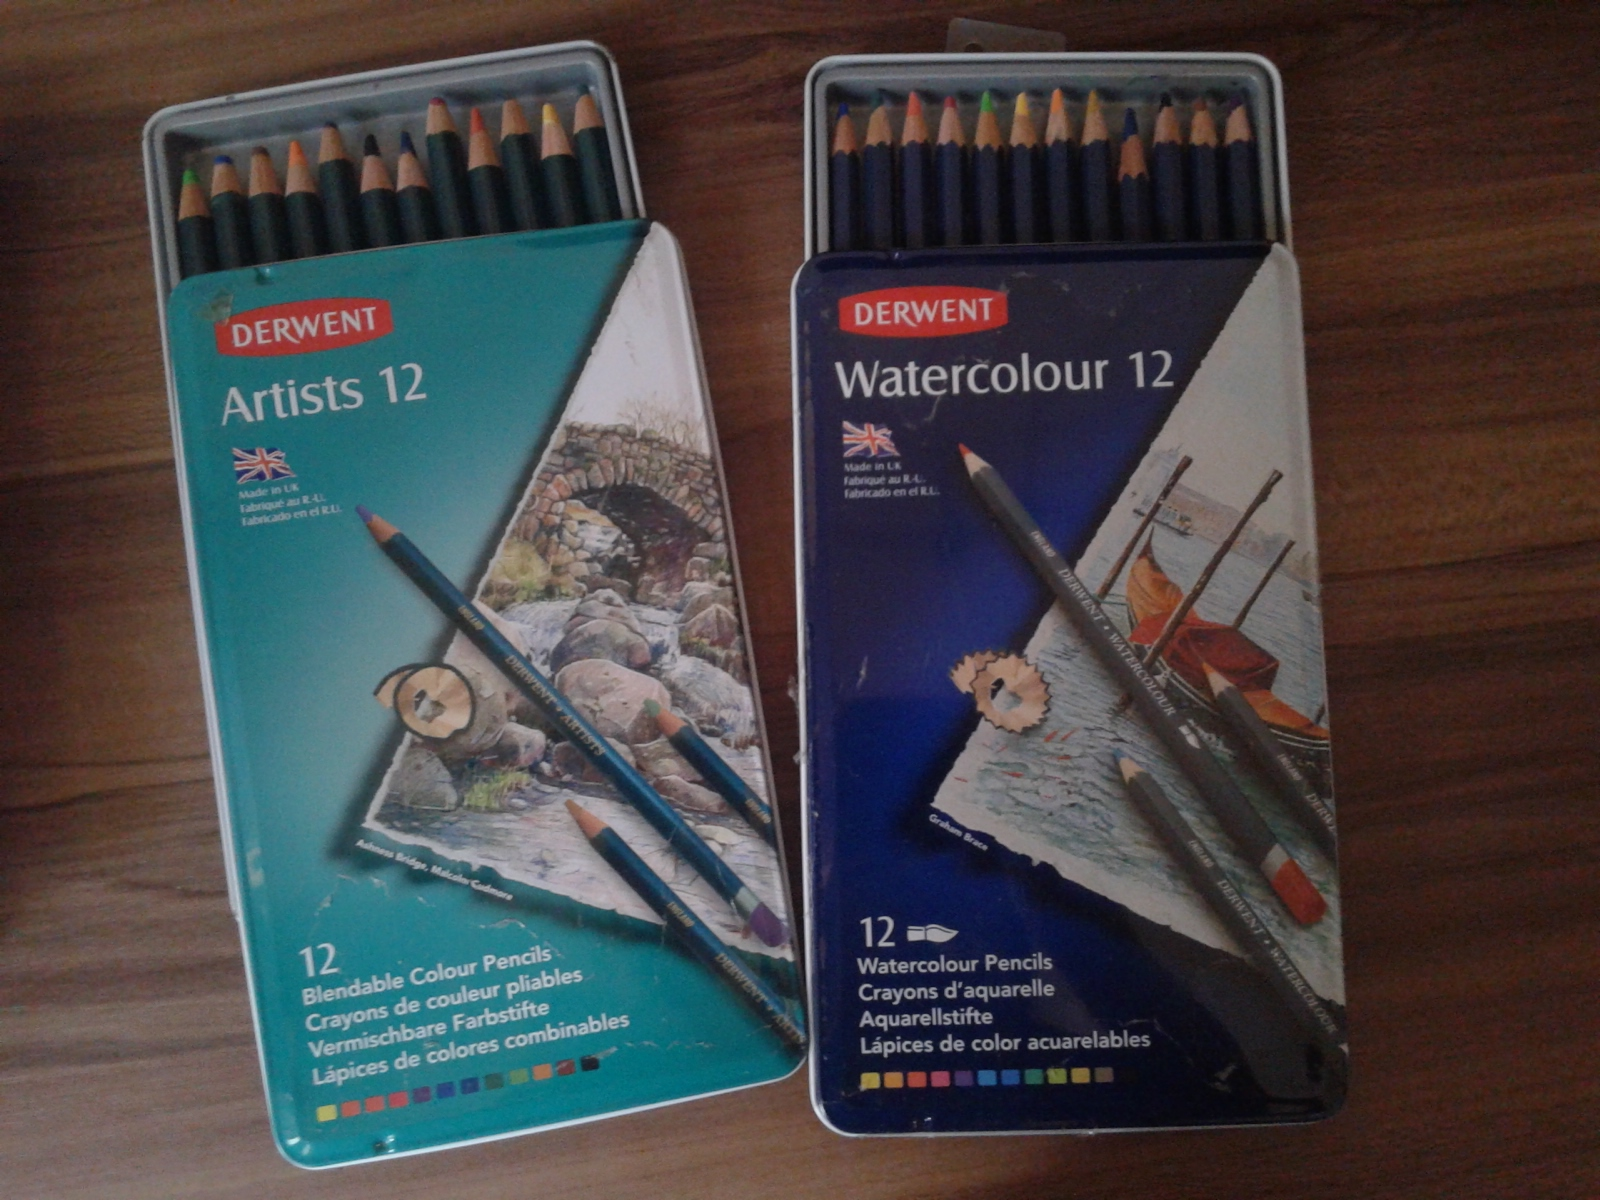 Sebelum membeli pensil warna kenali dulu ente cocoknya dengan jenis yang mana Pada umumnya ada dua jenis pensil warna yaitu Classic dan Watercolour